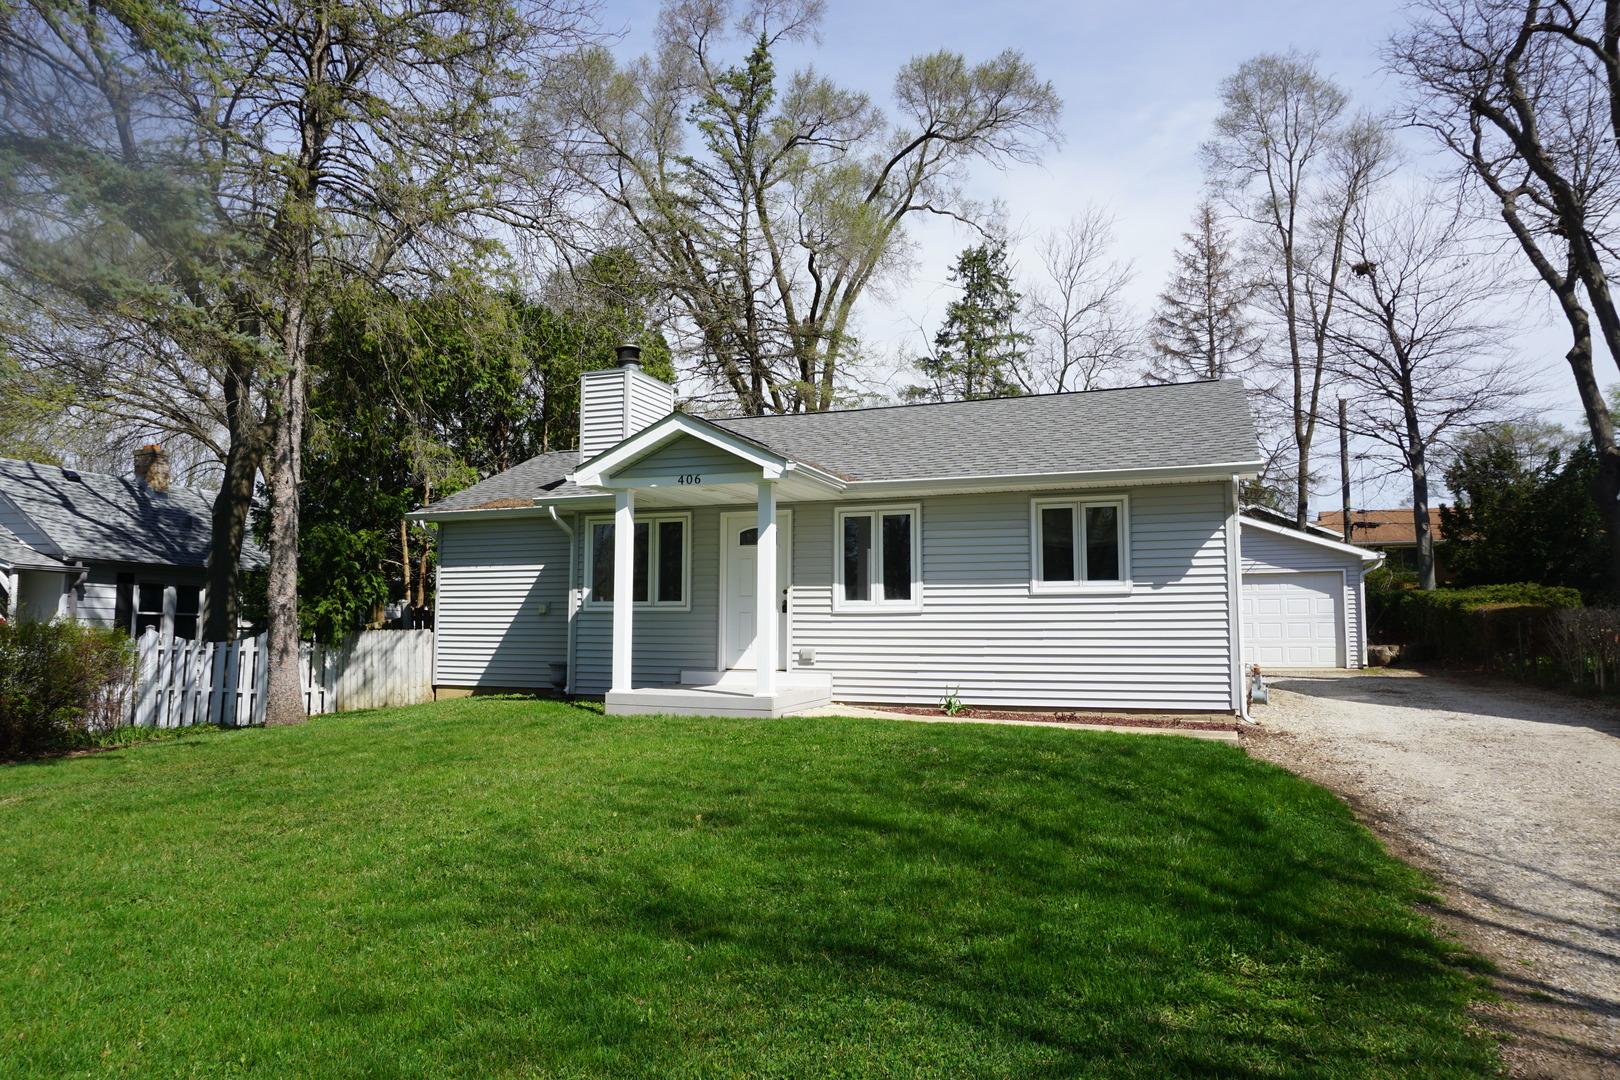 406 Woodbine Avenue, Island Lake, IL 60042